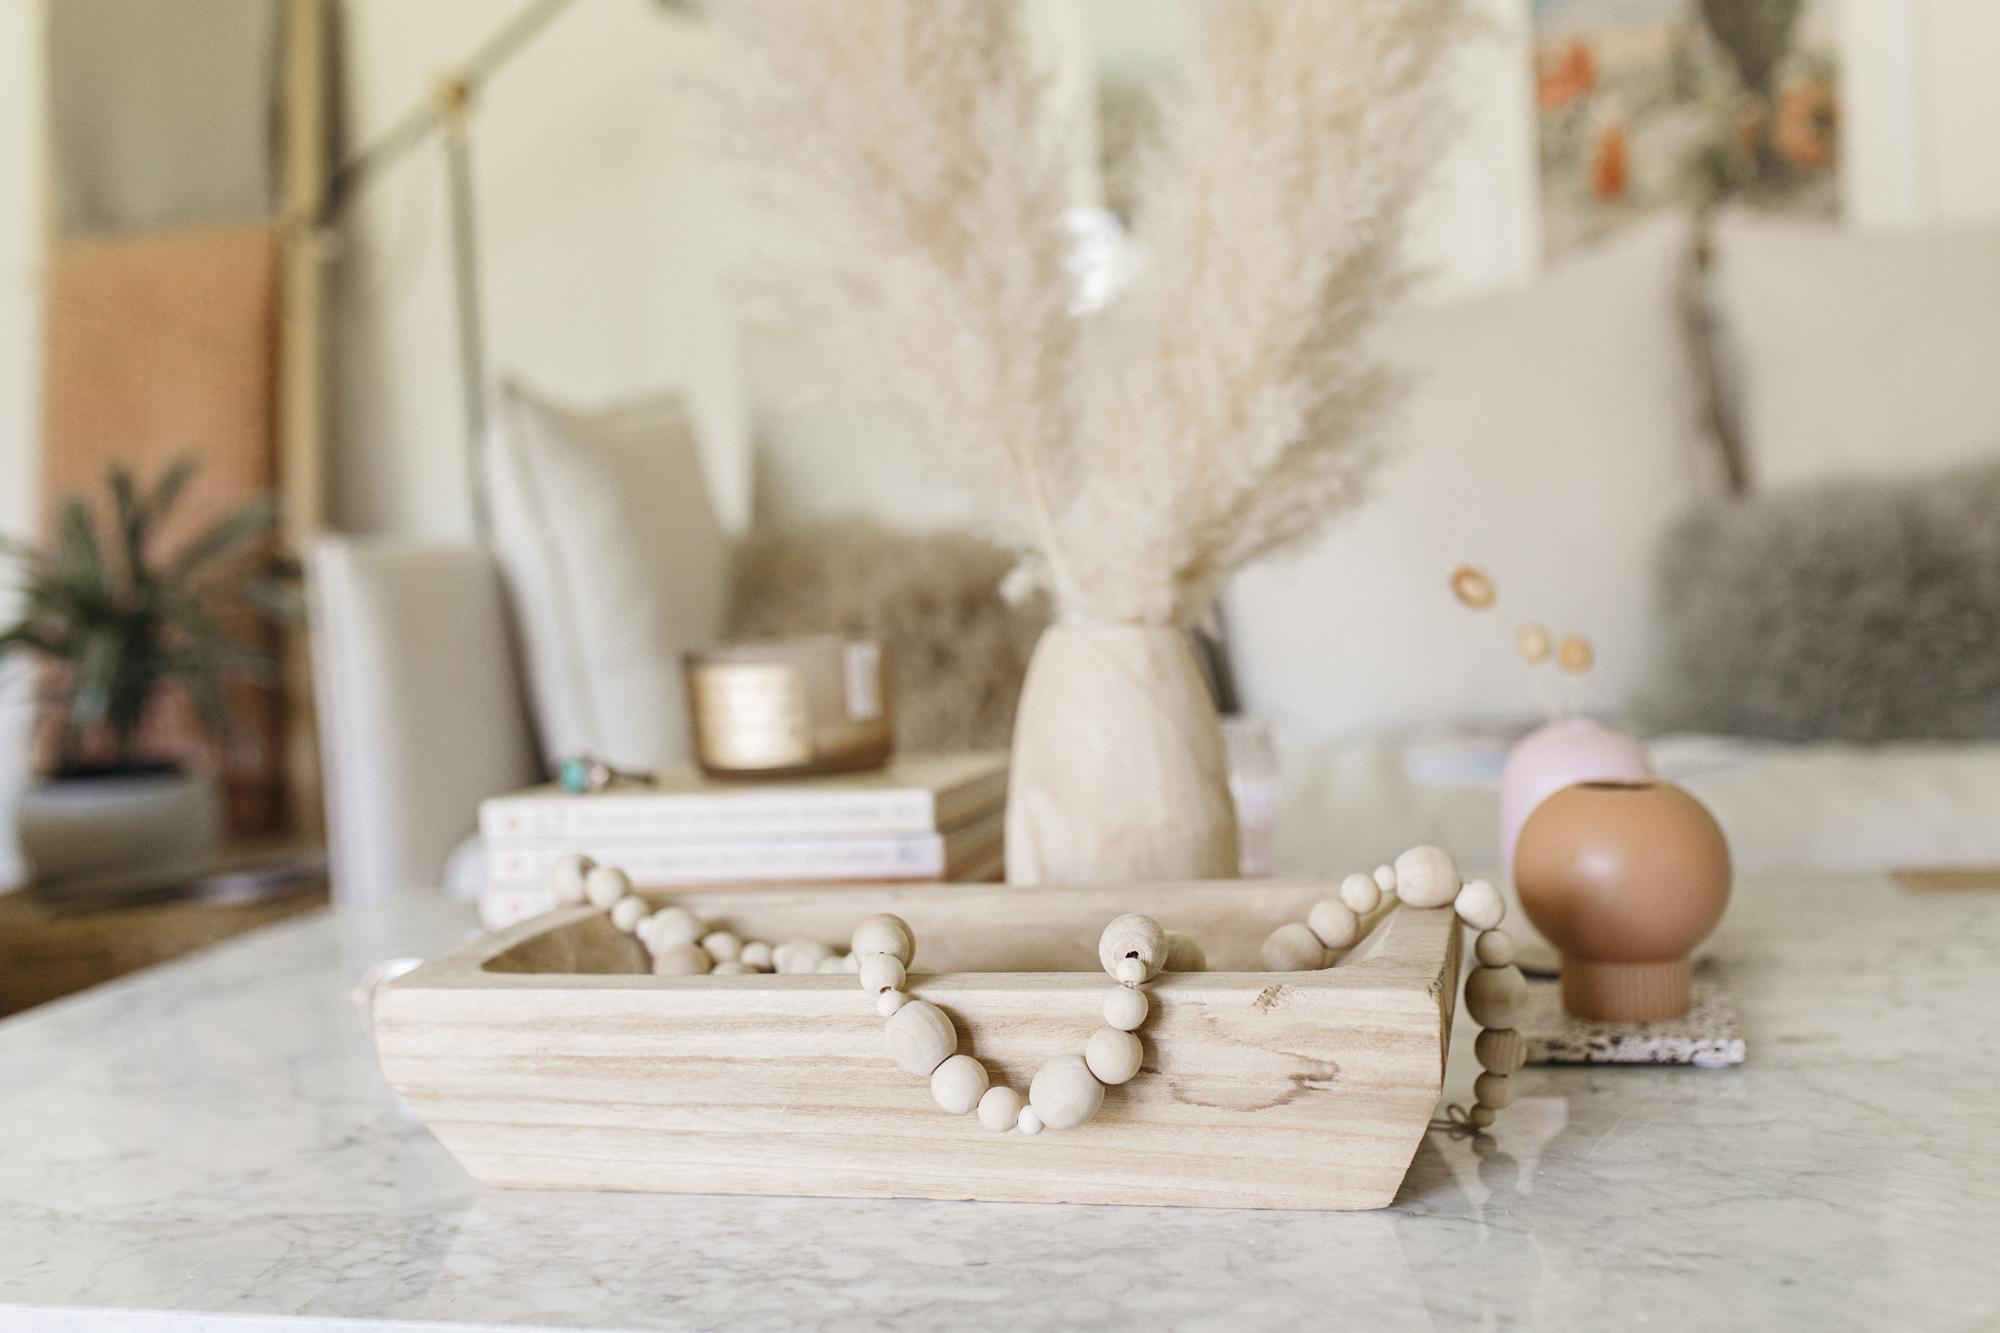 emilyrhess-blog-coffee-table-styling-mornings-15.jpg